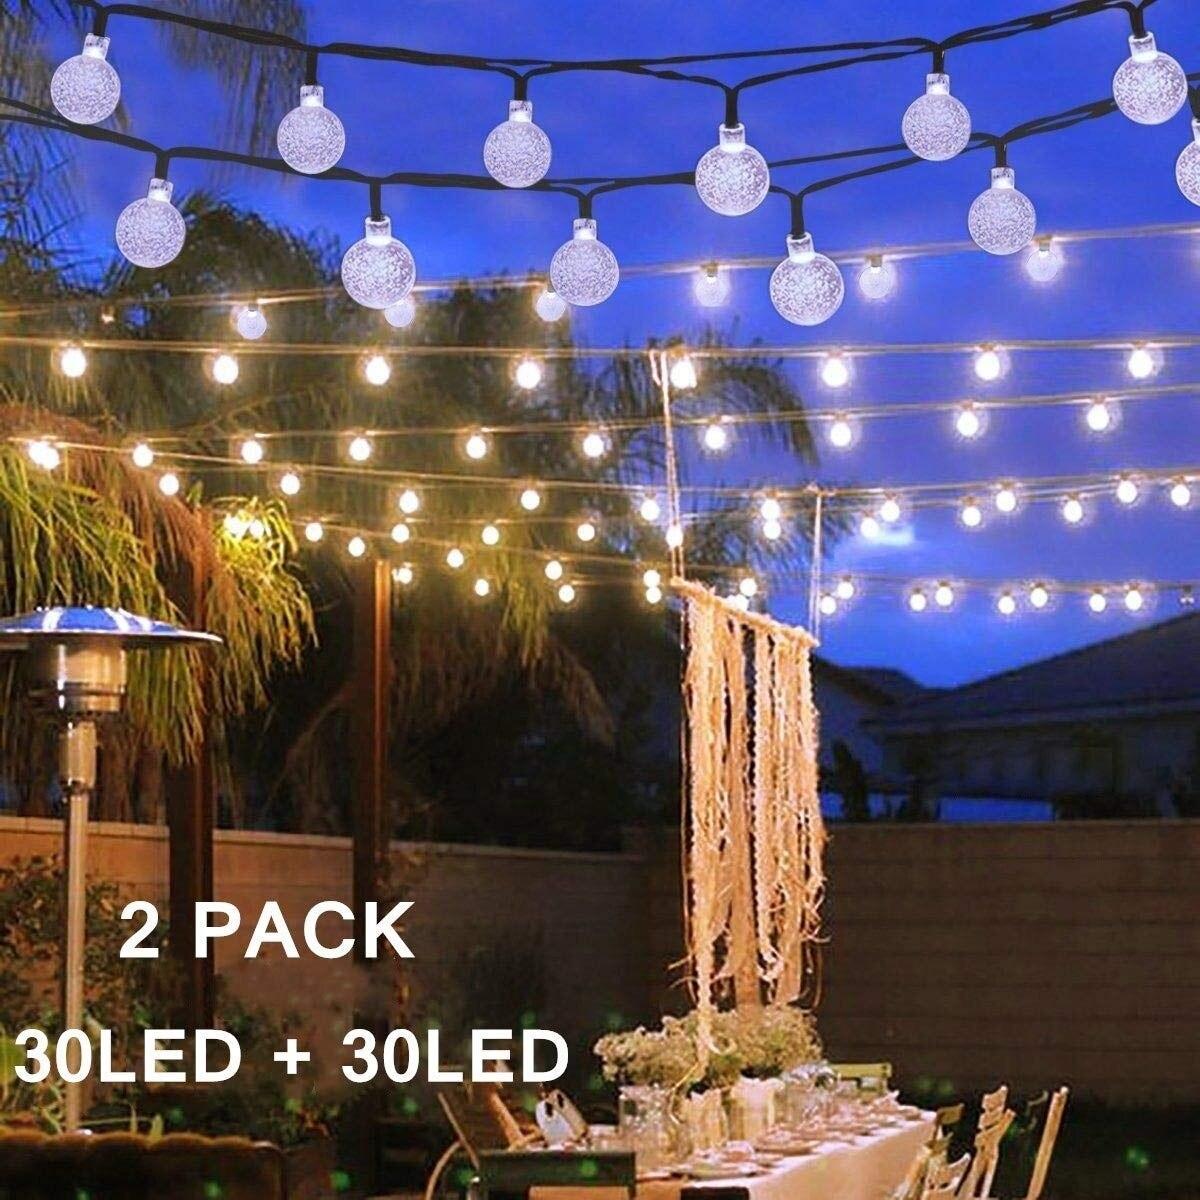 Solar Globe Lights LED String Lights 30 LED 19.8ft  Waterproof Fairy Garland For Outdoor Garden Christmas Wedding Decoration